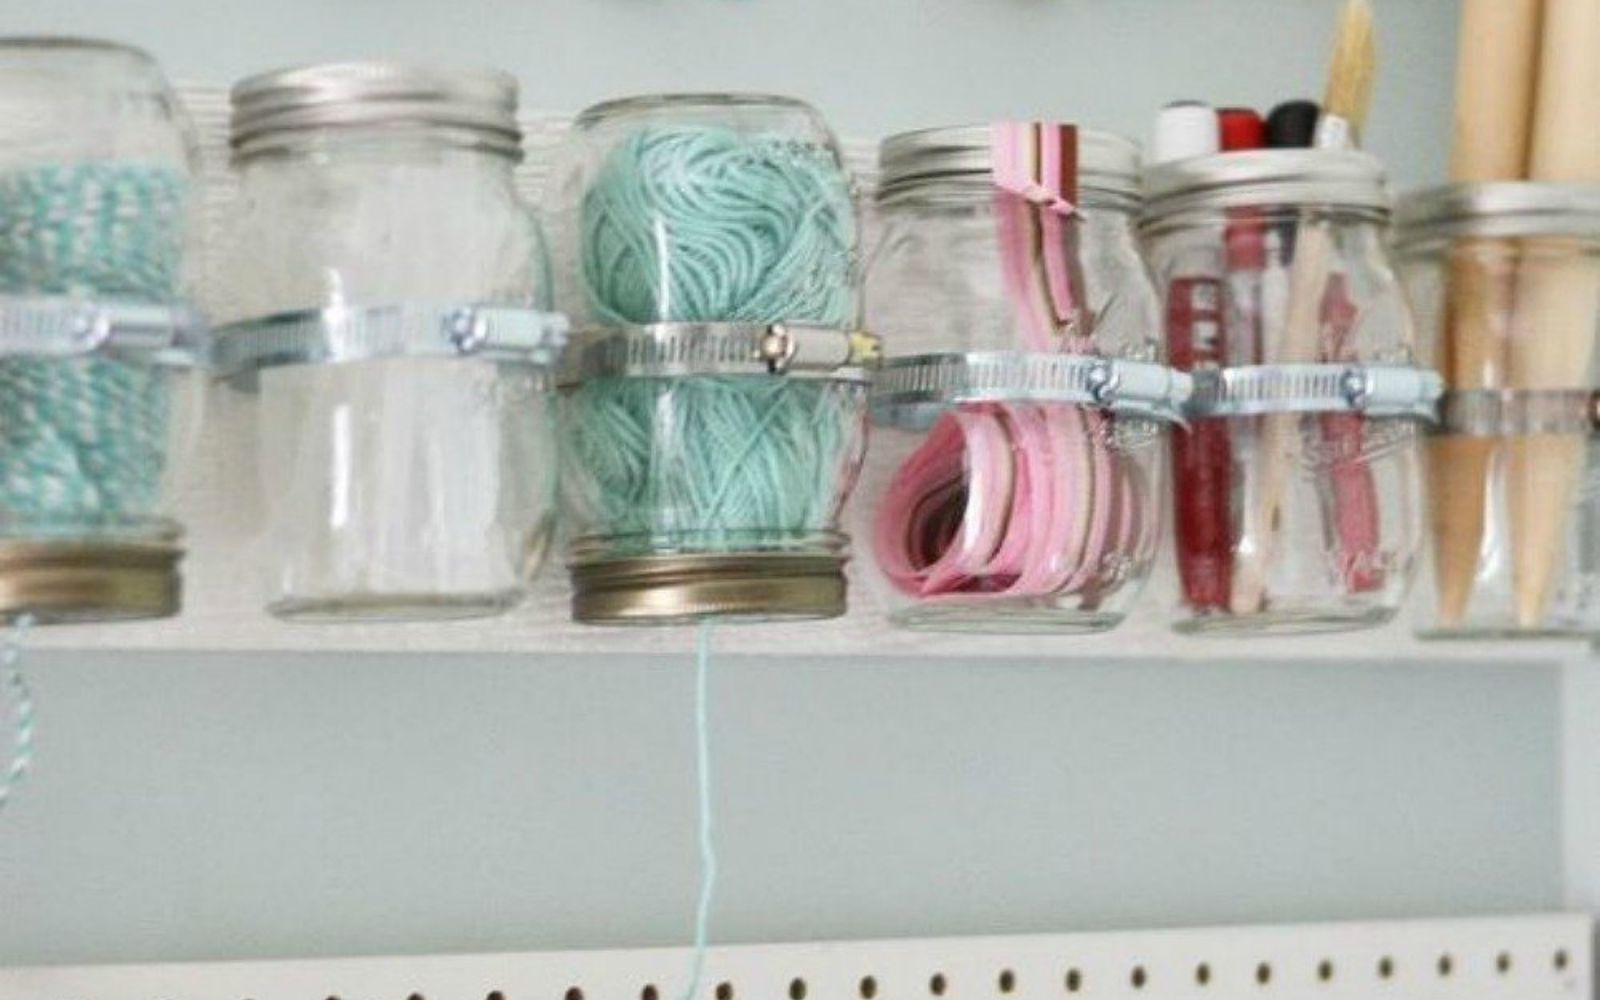 s 14 exciting mason jar ideas you just have to try, mason jars, 11 The crafty creative shelf idea